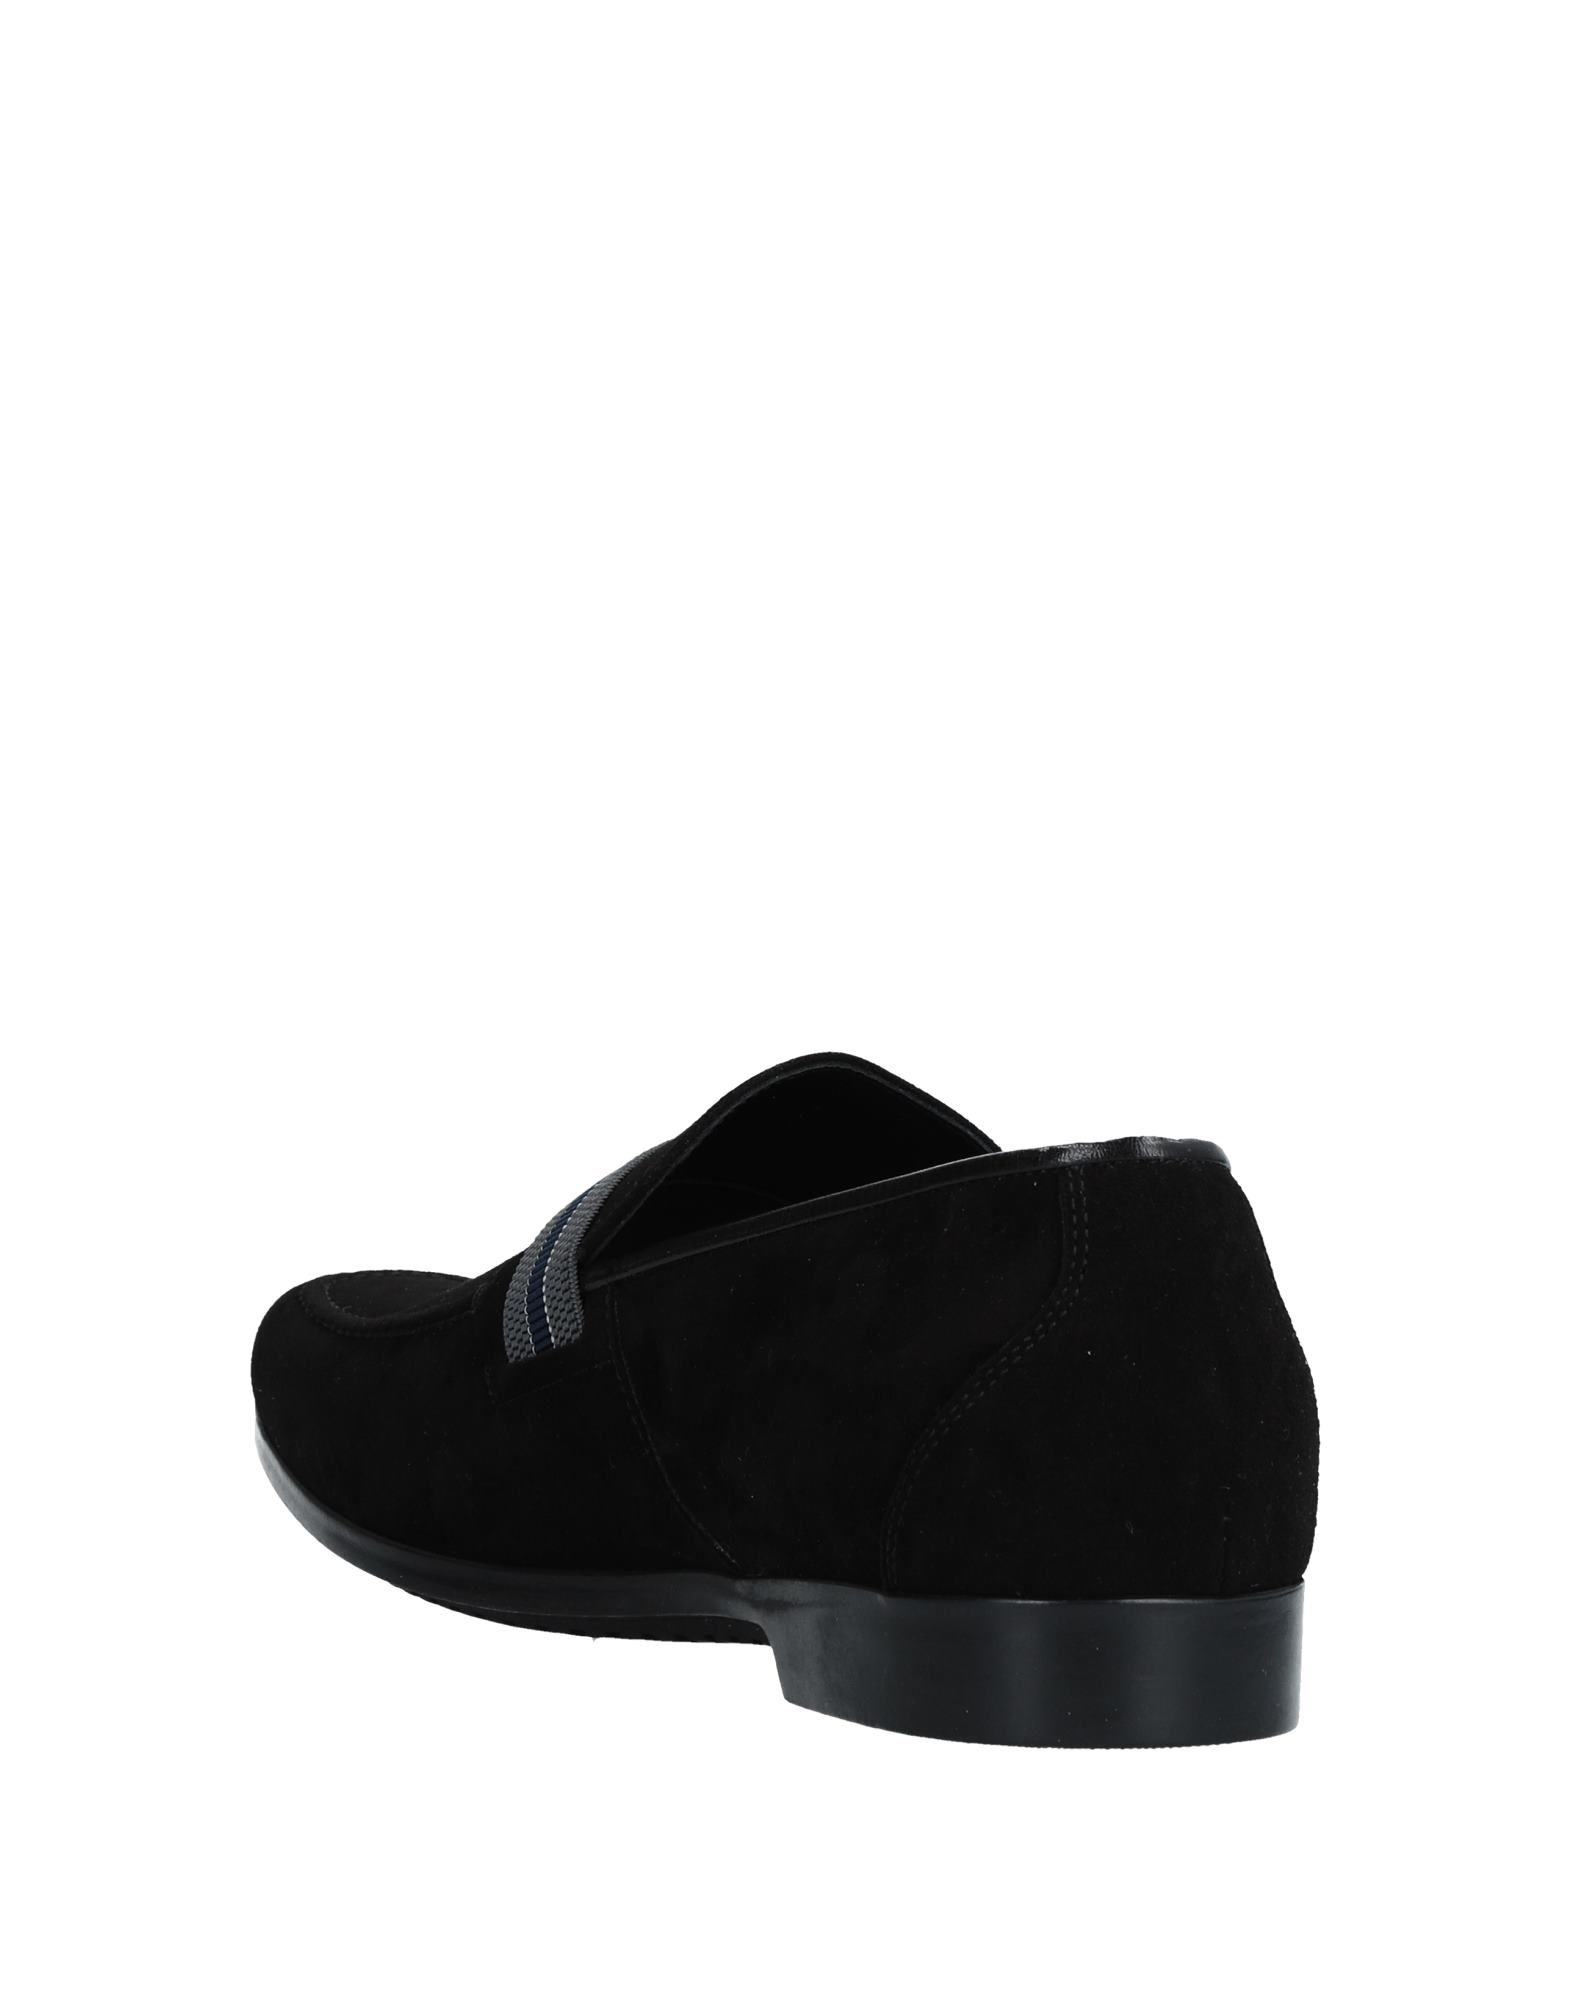 Fabi Gute Mokassins Herren  11543422MK Gute Fabi Qualität beliebte Schuhe 6b5637